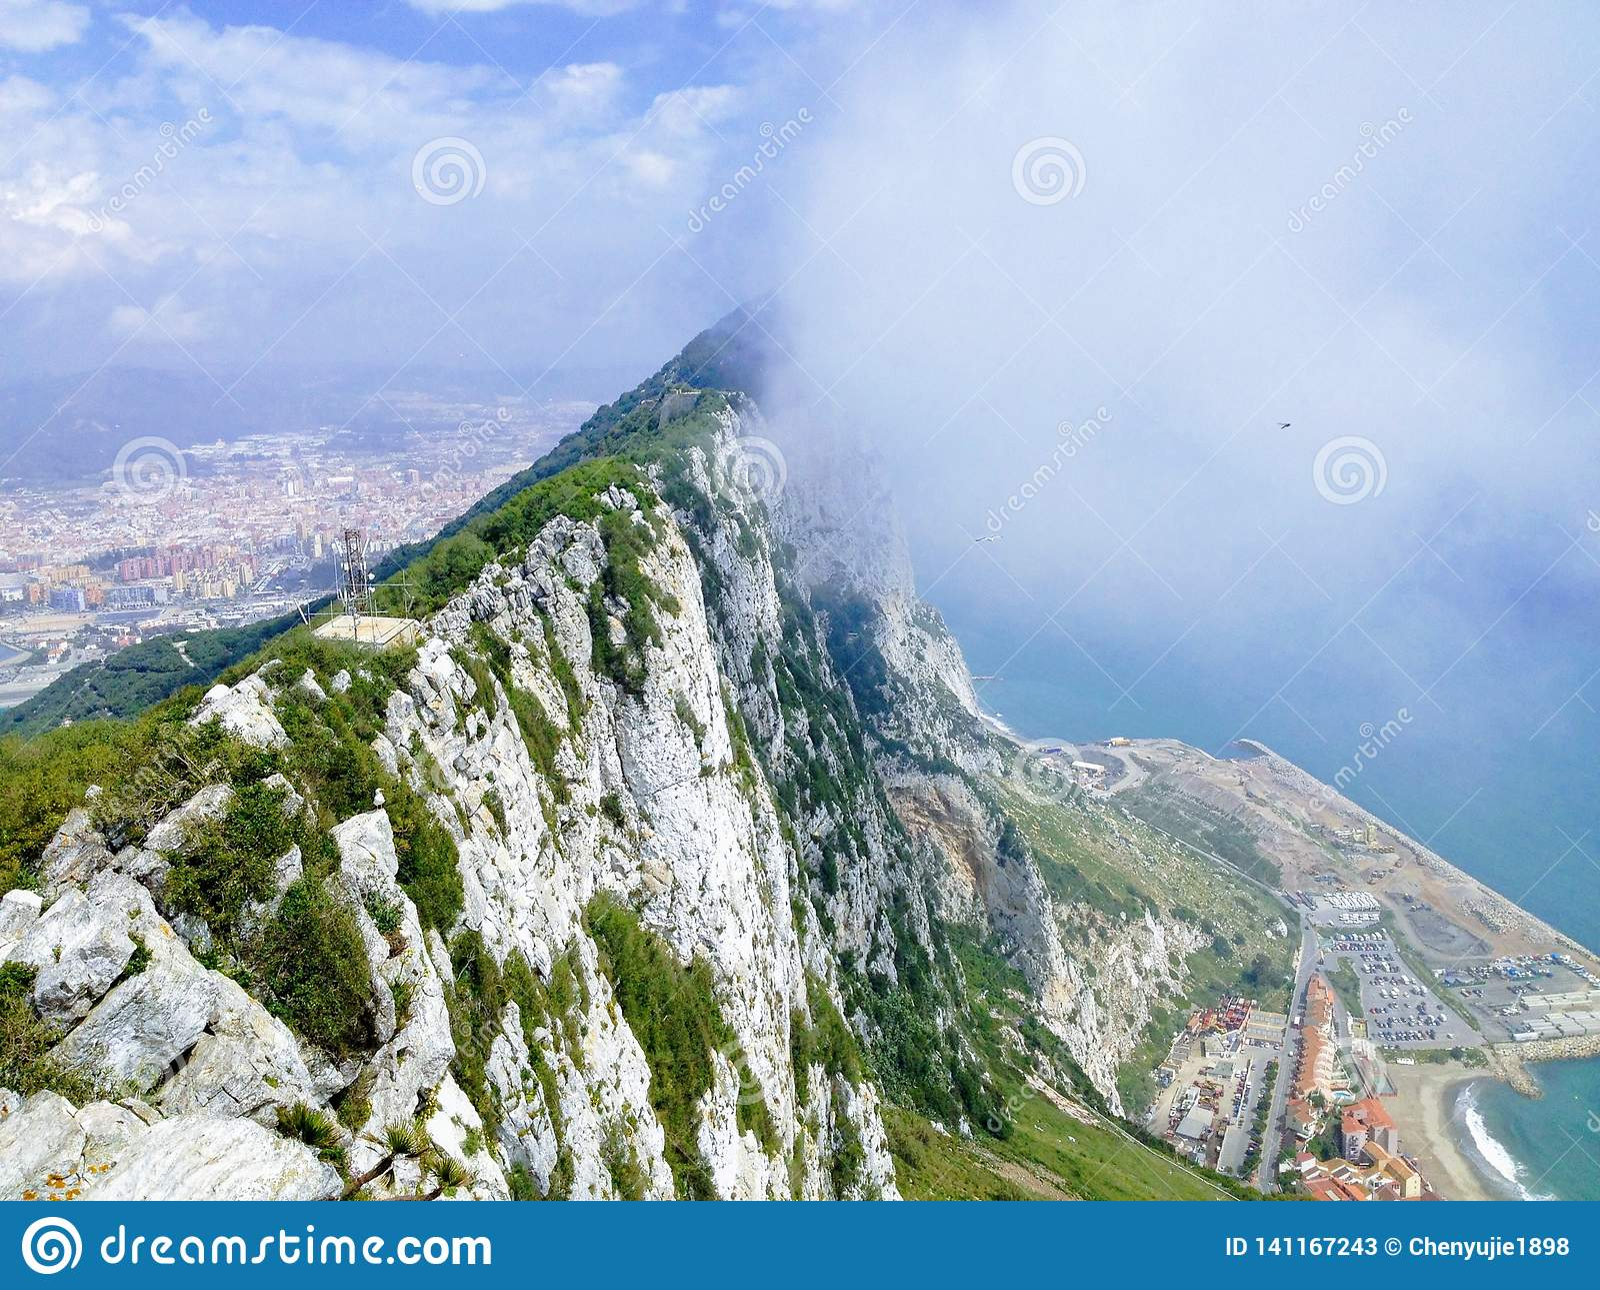 La roche de Gibralt, nuageuse